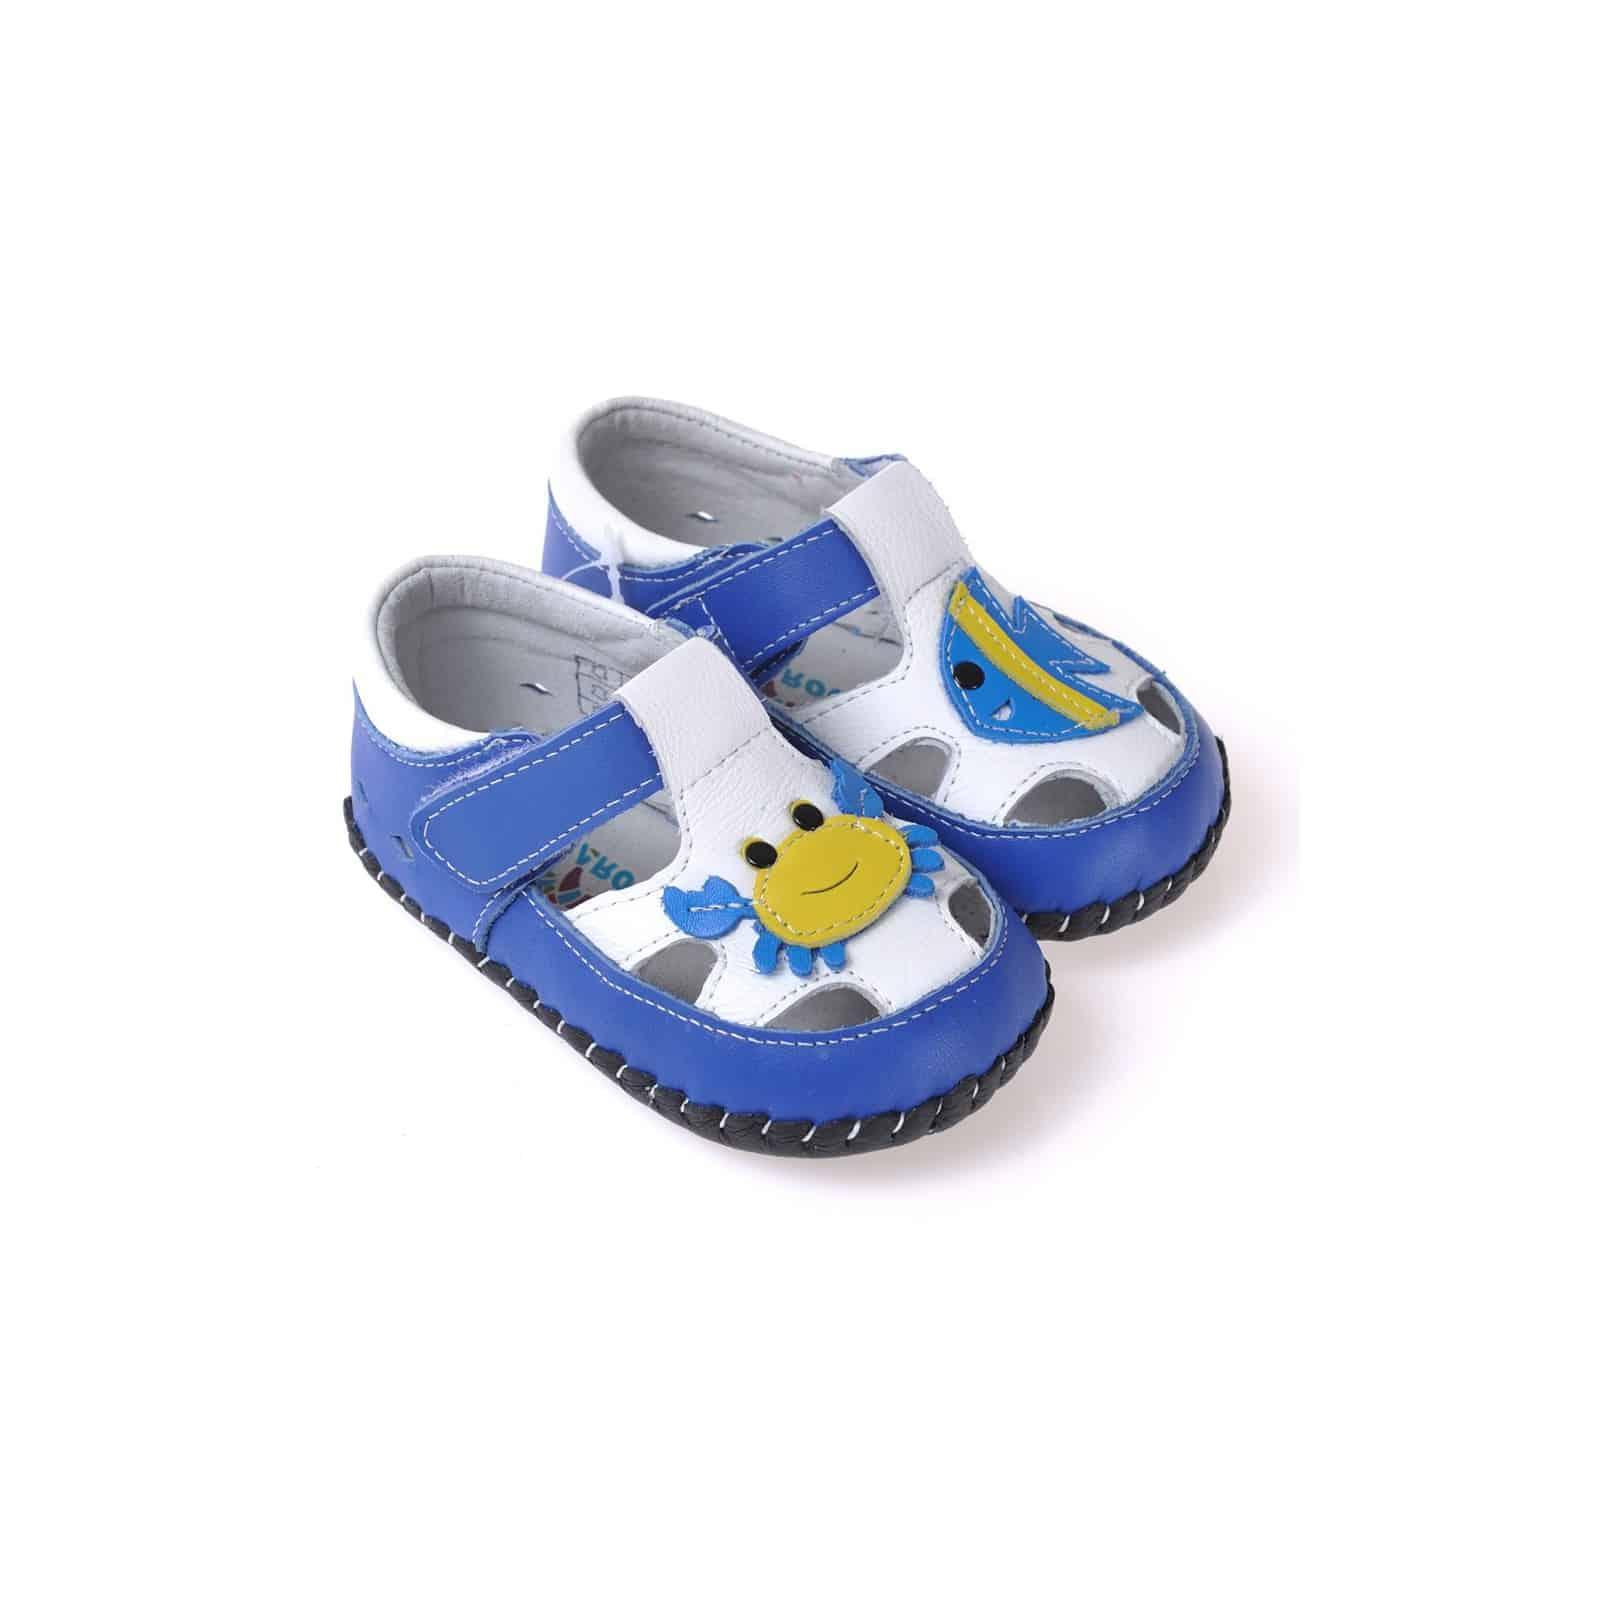 CAROCH- Baby boys first steps soft